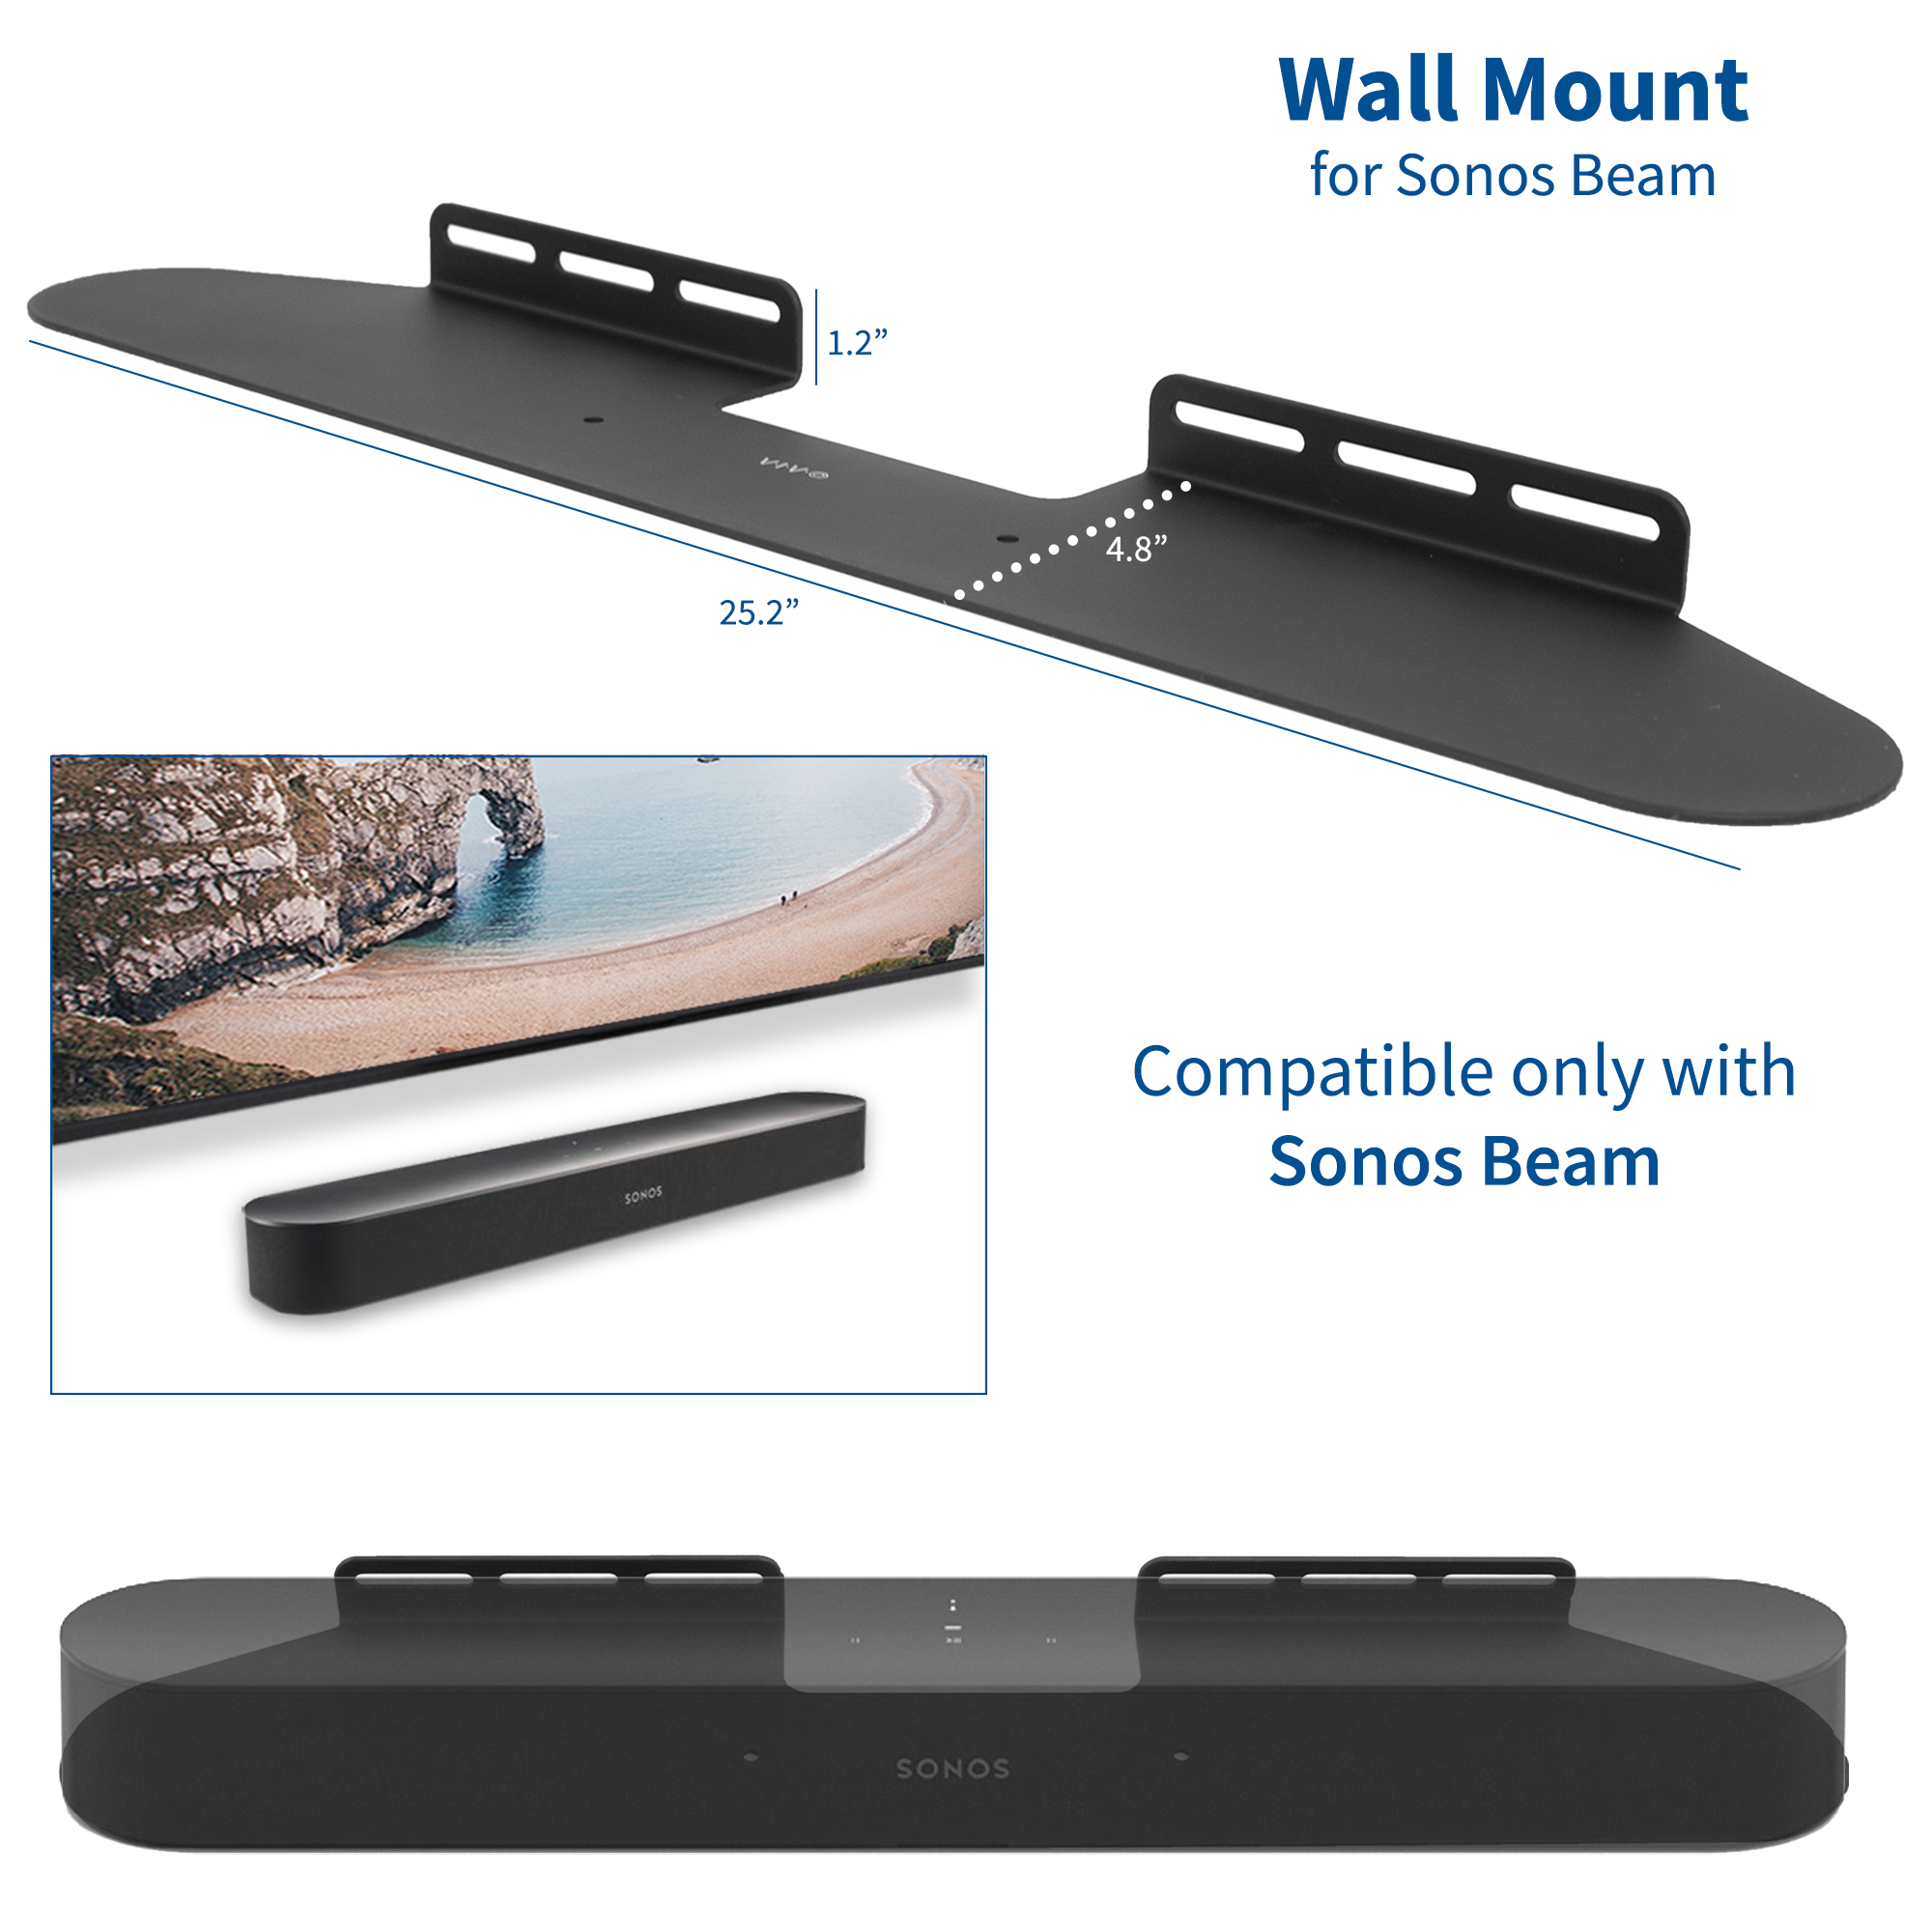 vivo black steel wall mount speaker bracket designed for sonos beam sound bar shelf wall mounting kit mount sonos2b